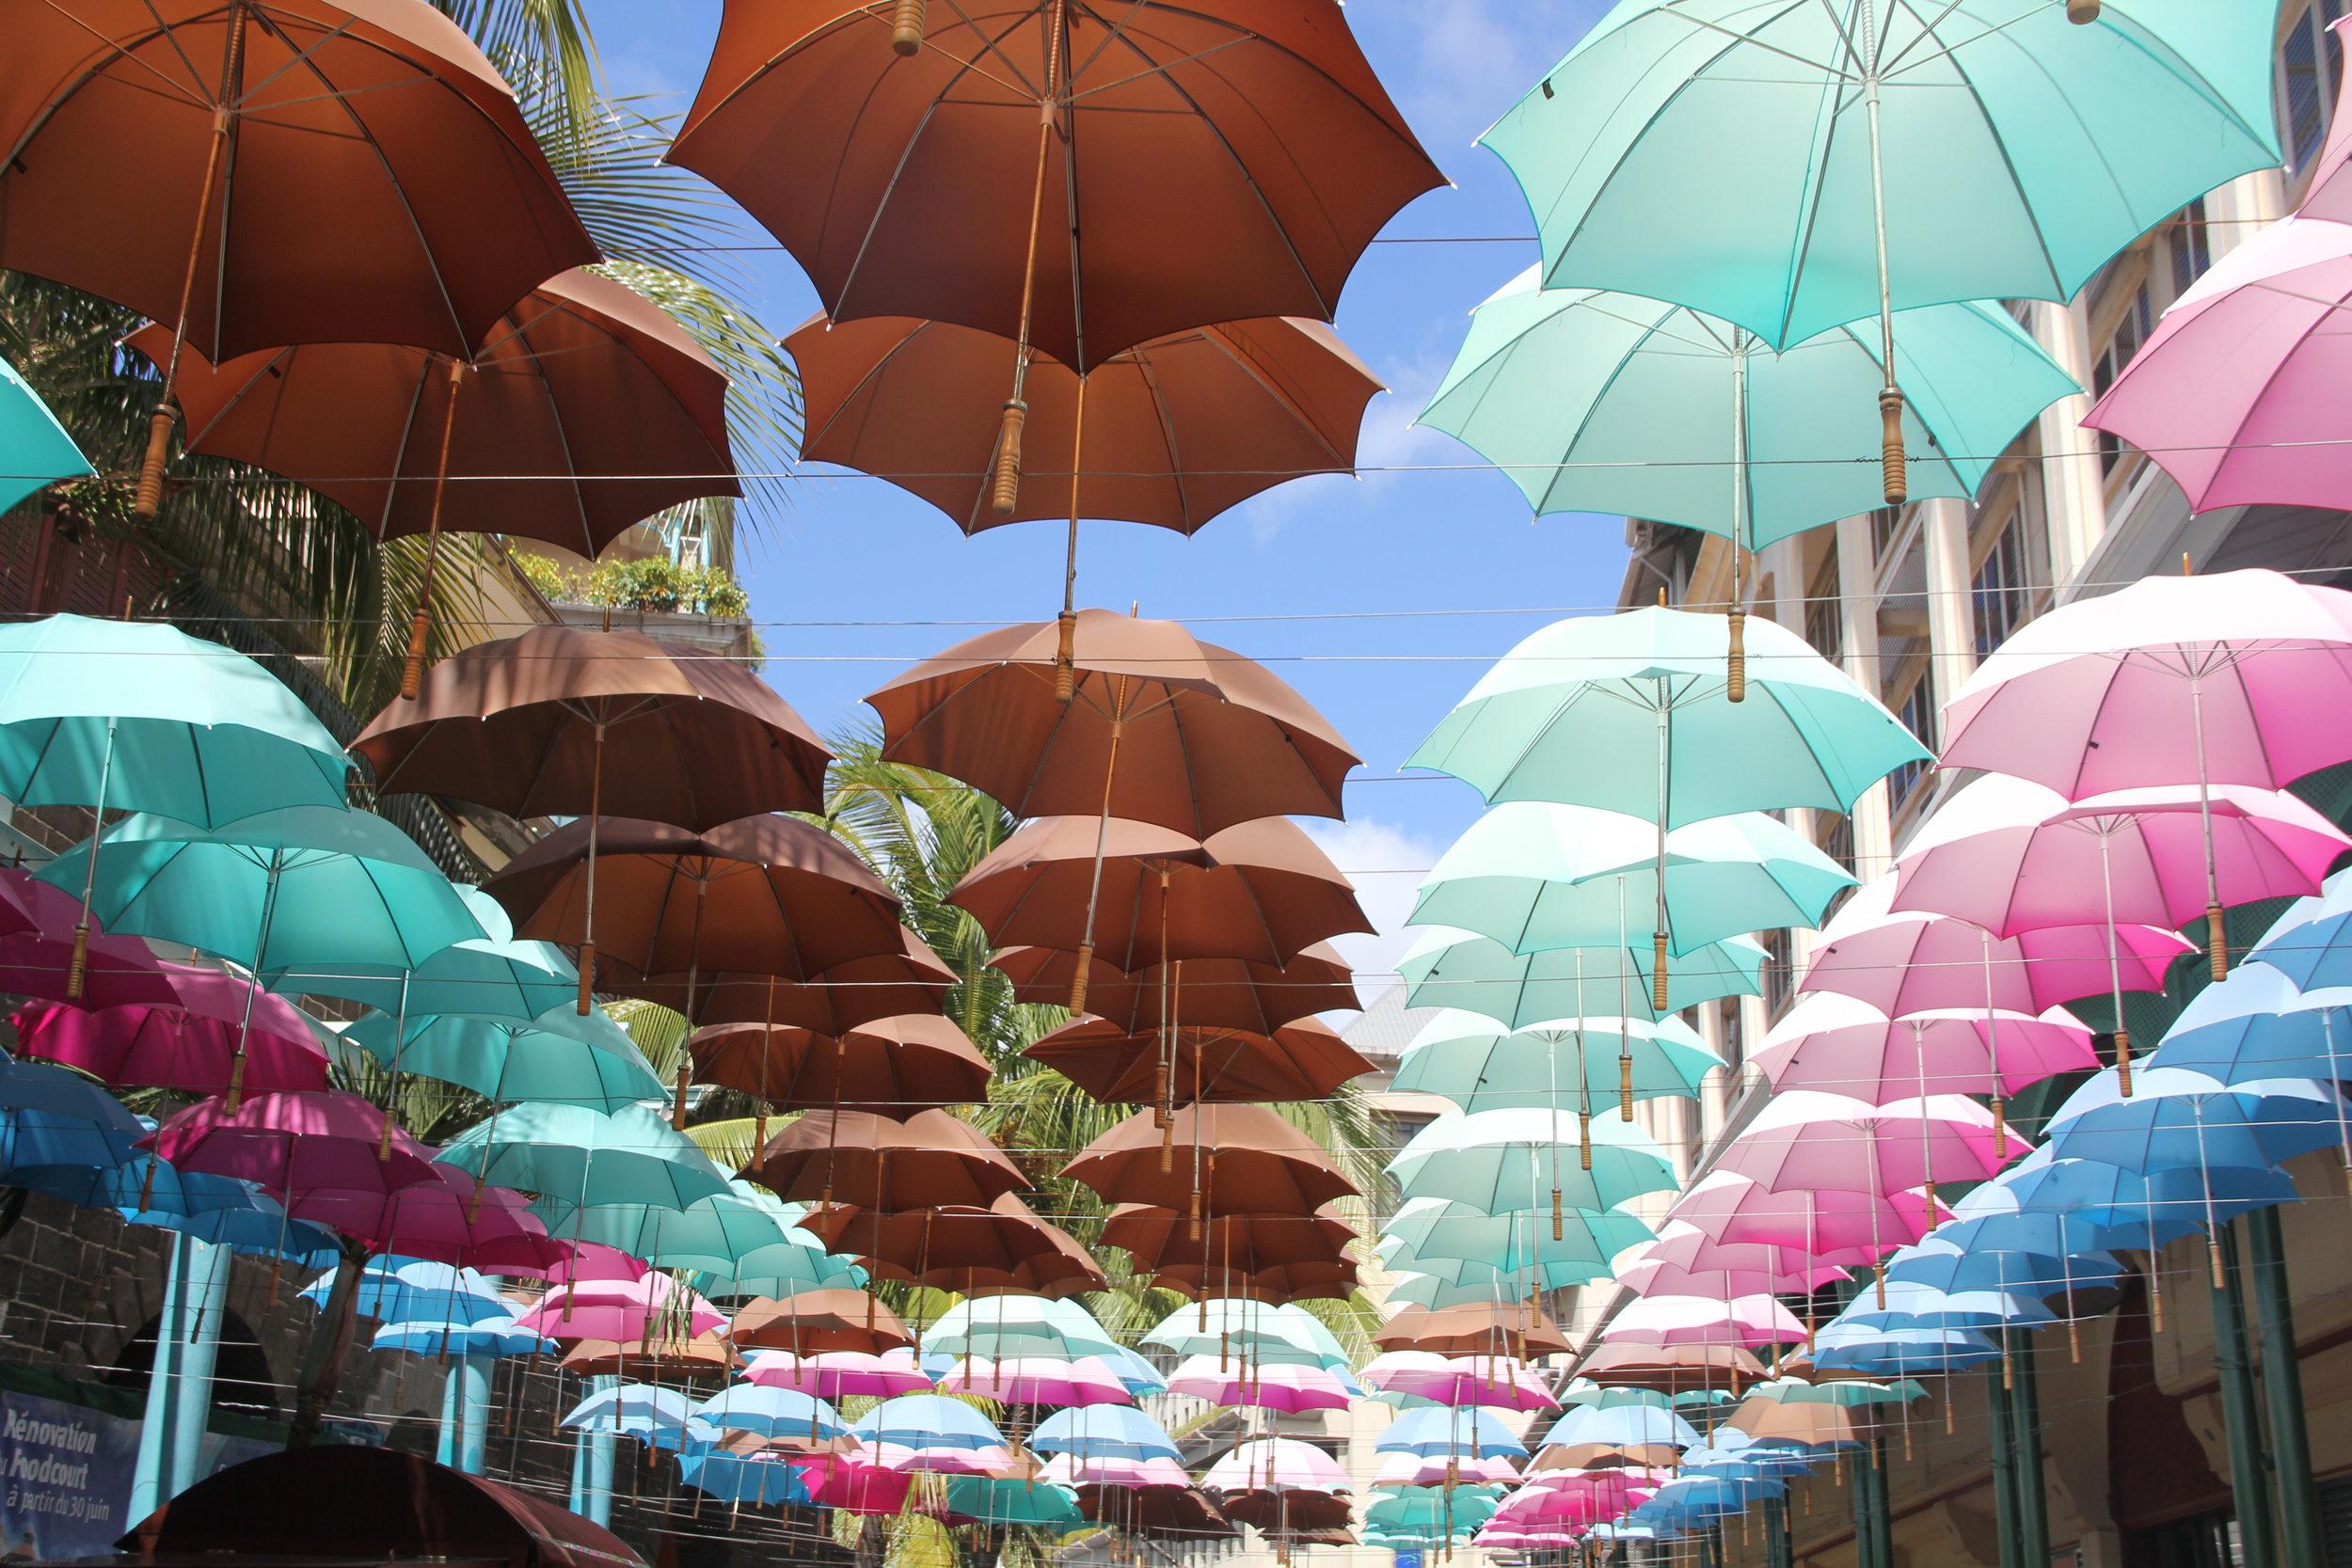 Flea Market at Caudan Waterfront